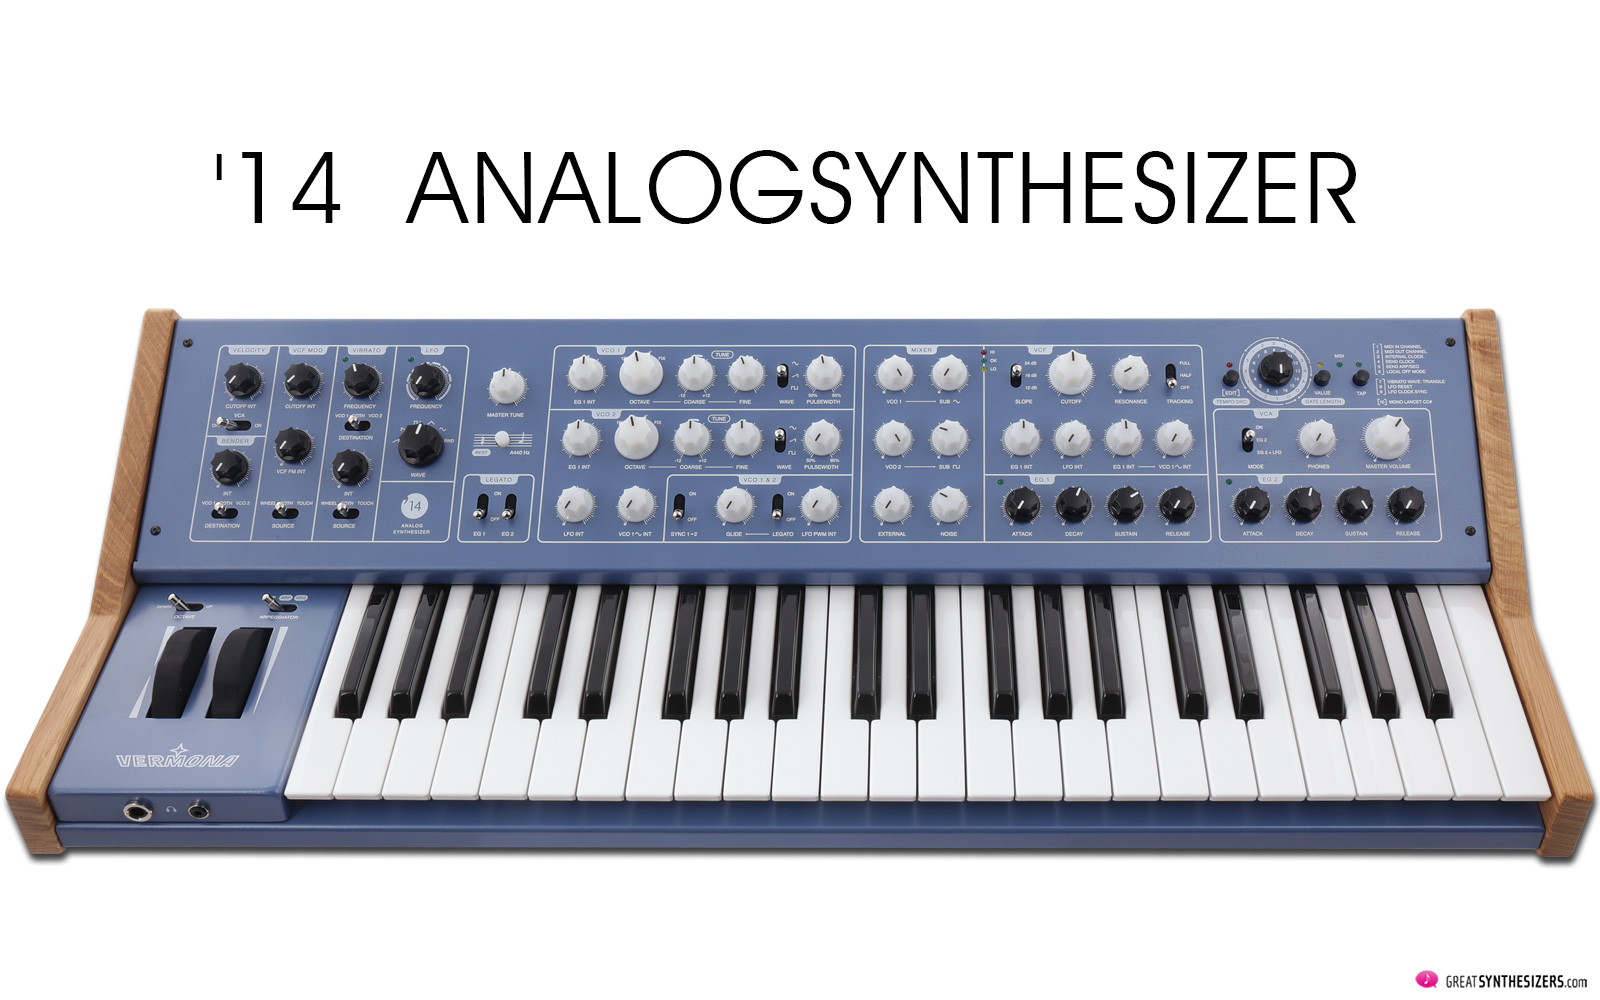 Vermona 14 Analogsynthesizer